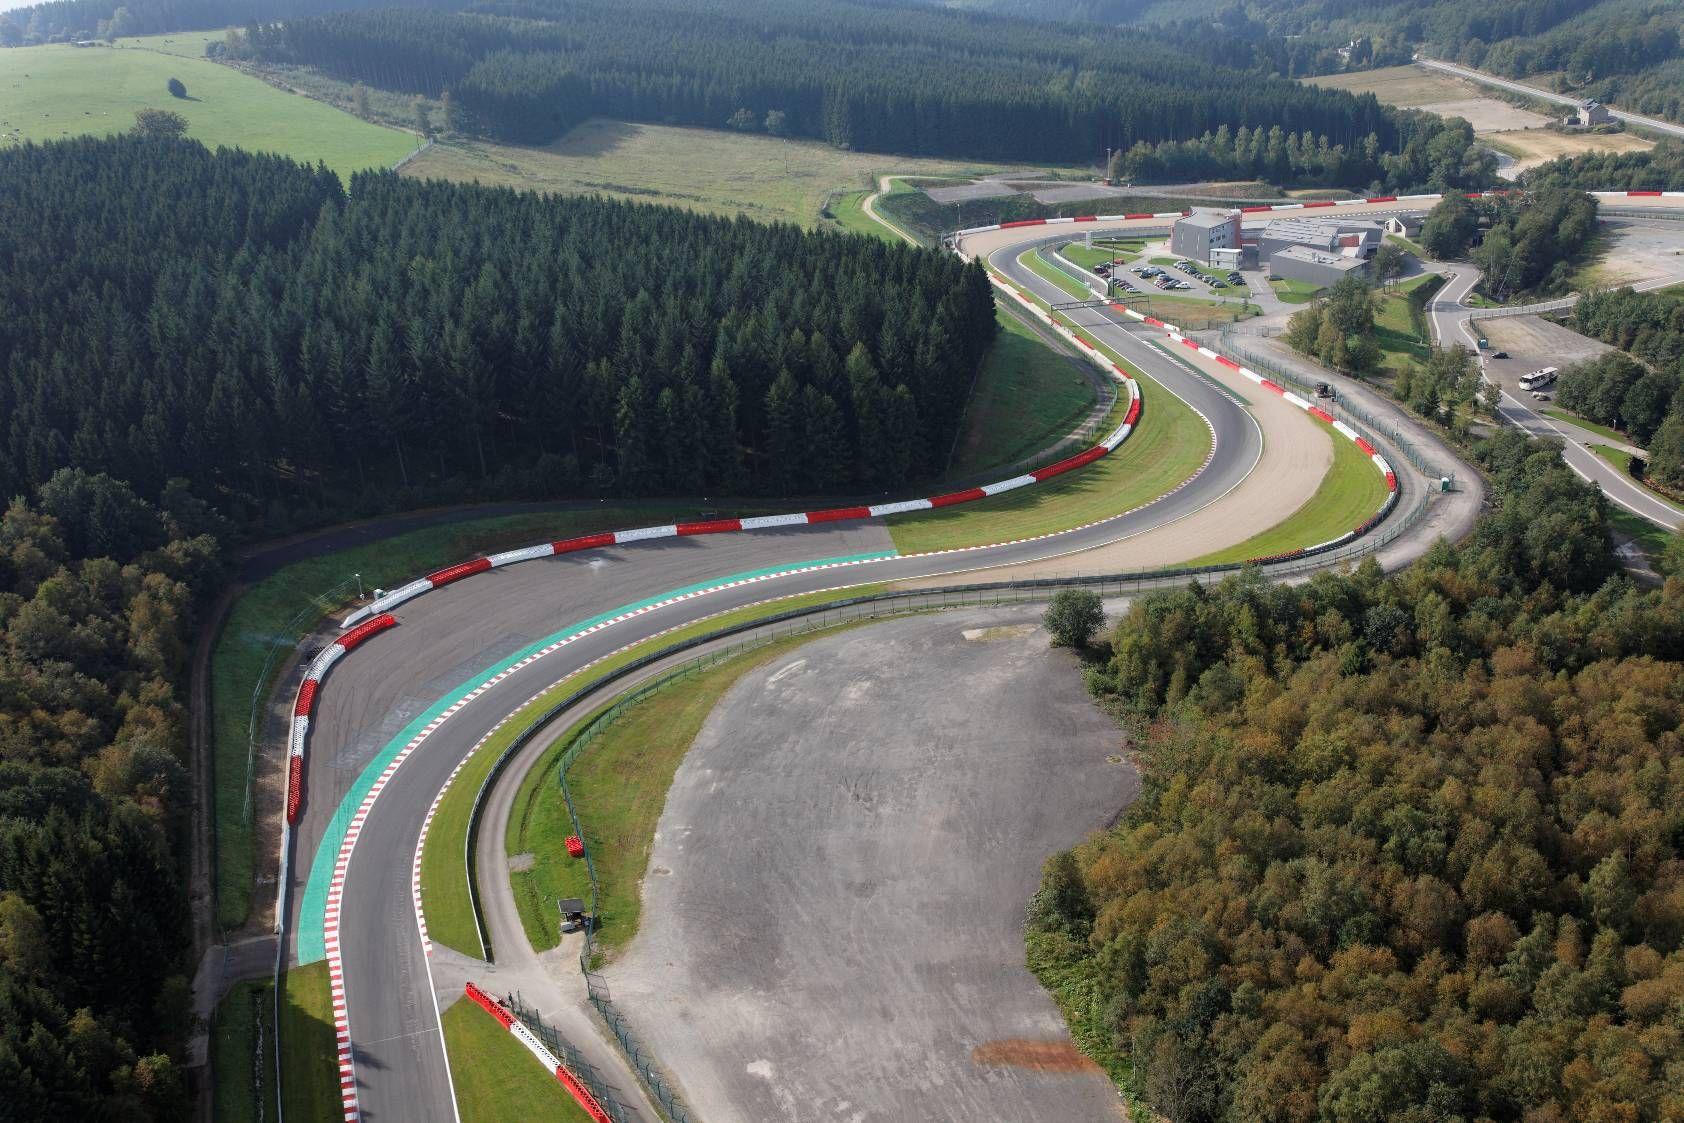 circuit de spa francorchamps racetracks pinterest circuits and race tracks. Black Bedroom Furniture Sets. Home Design Ideas